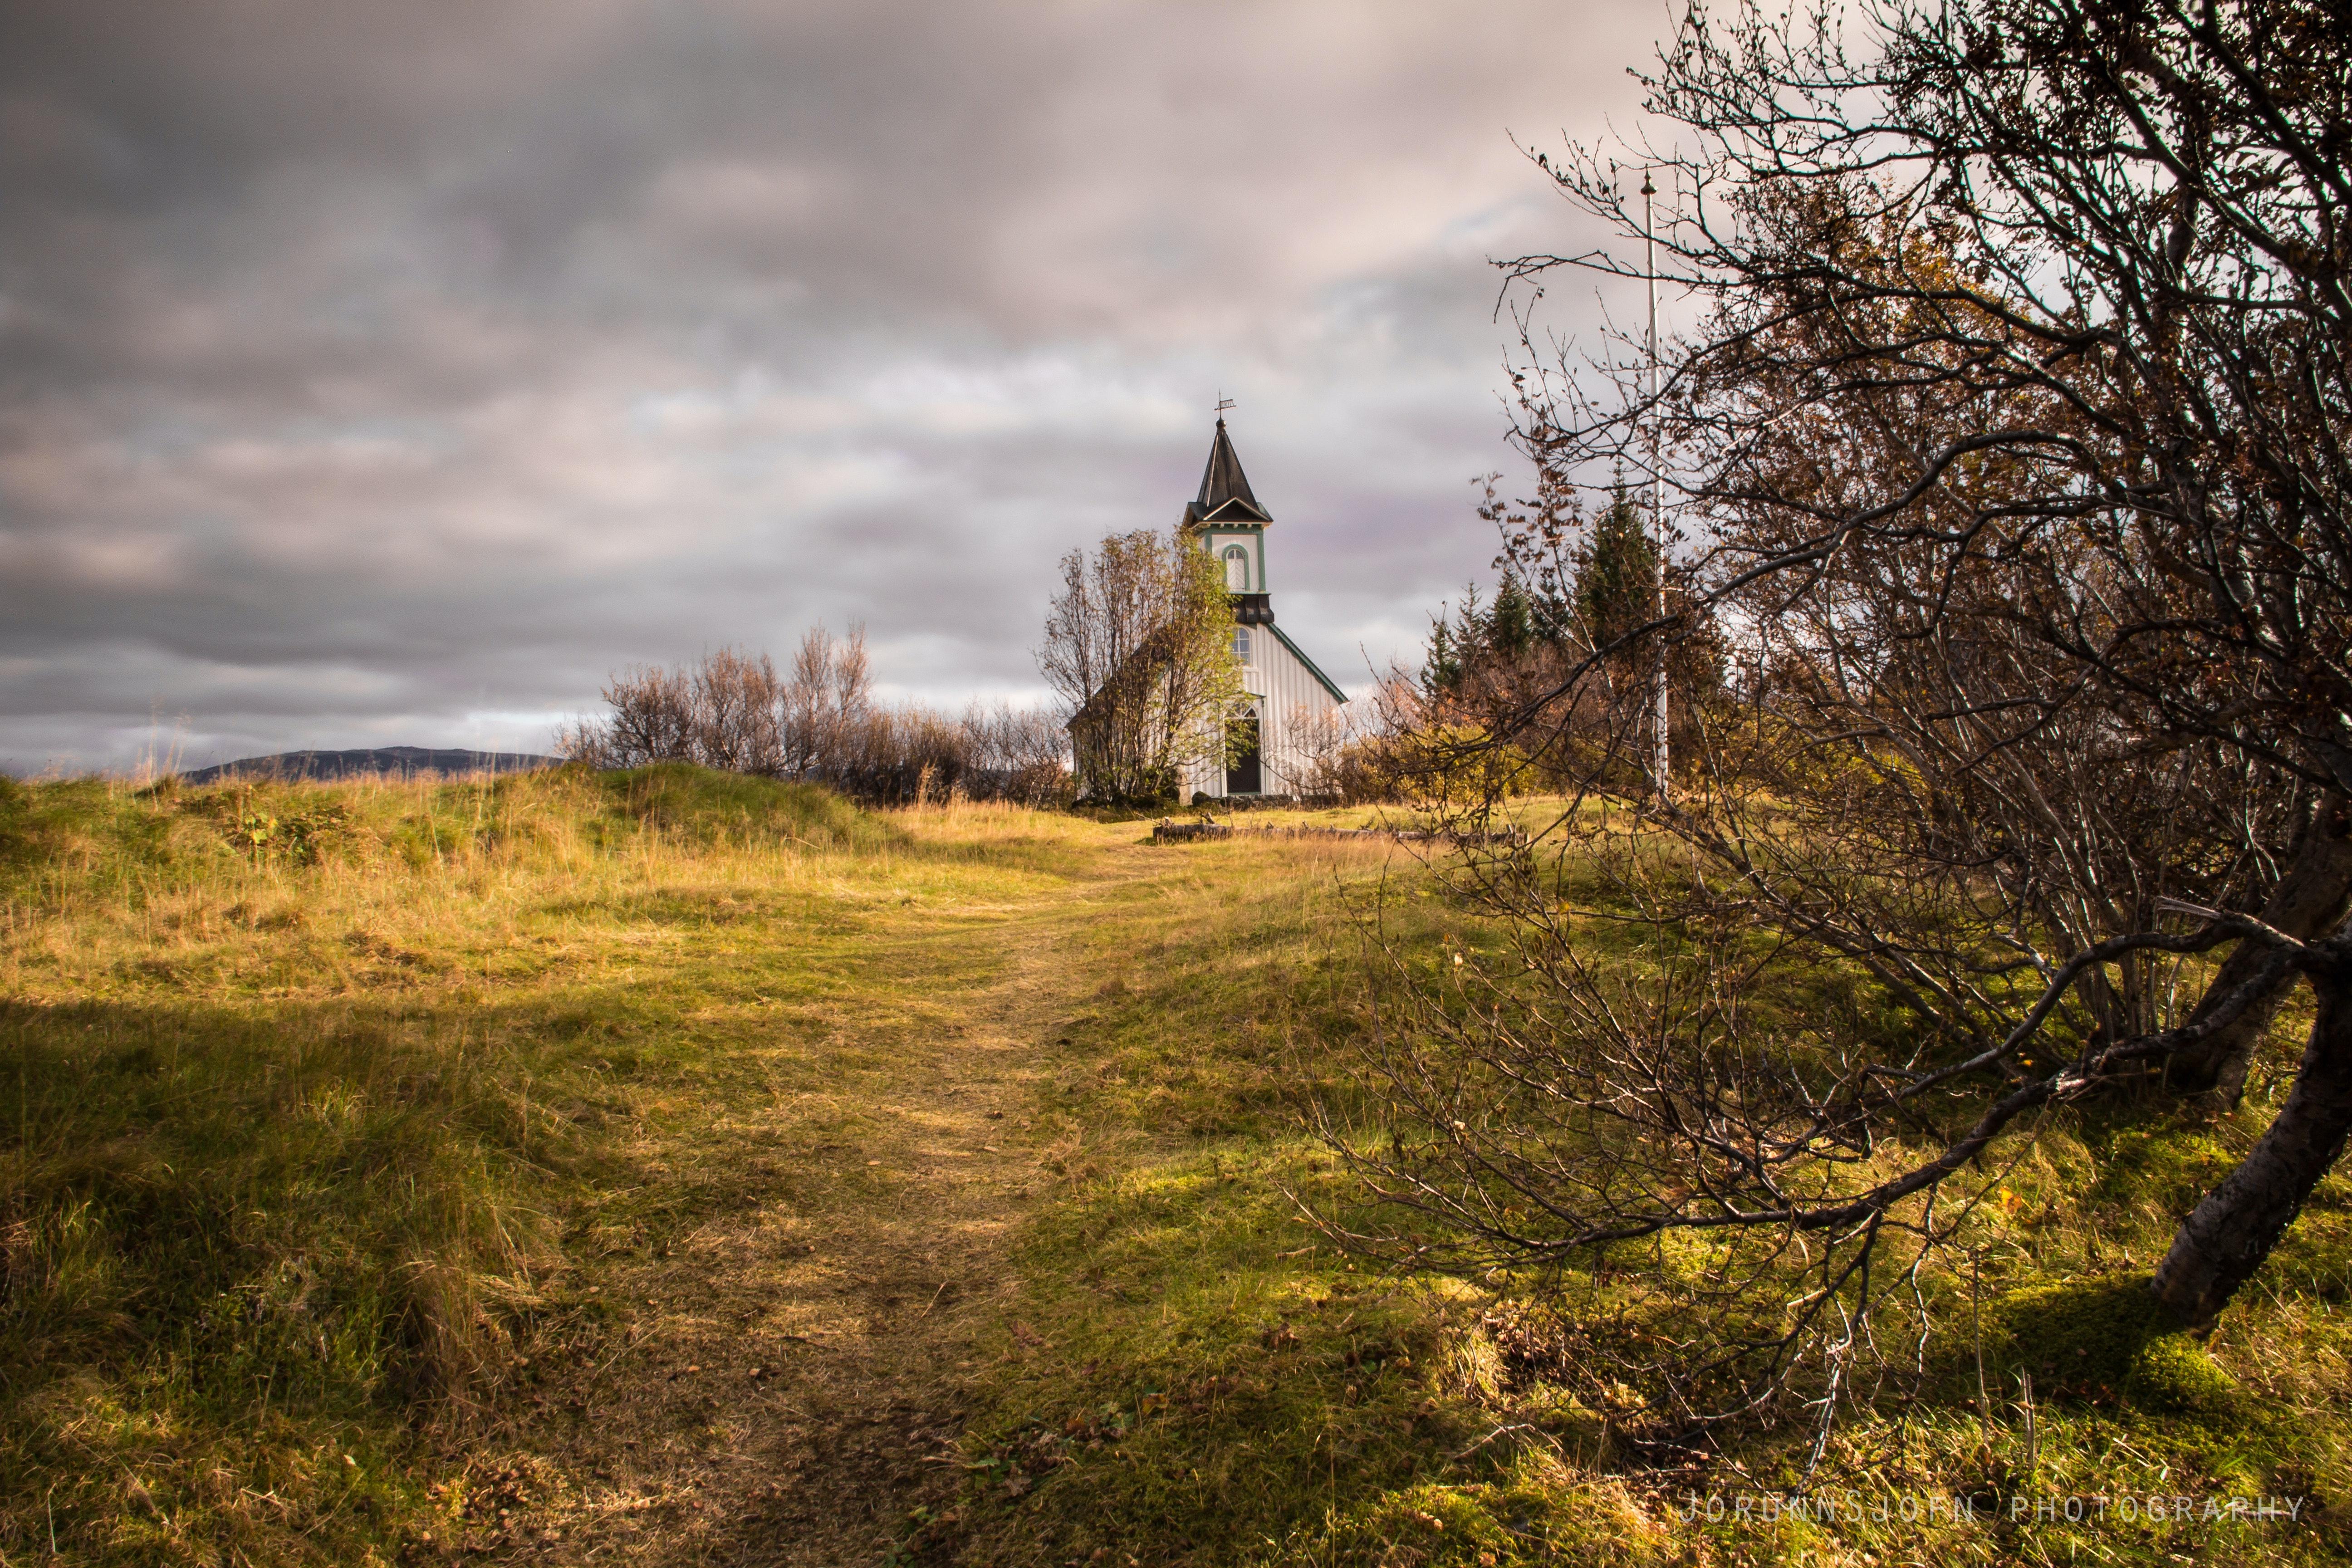 Thingvallakirkja church in Iceland